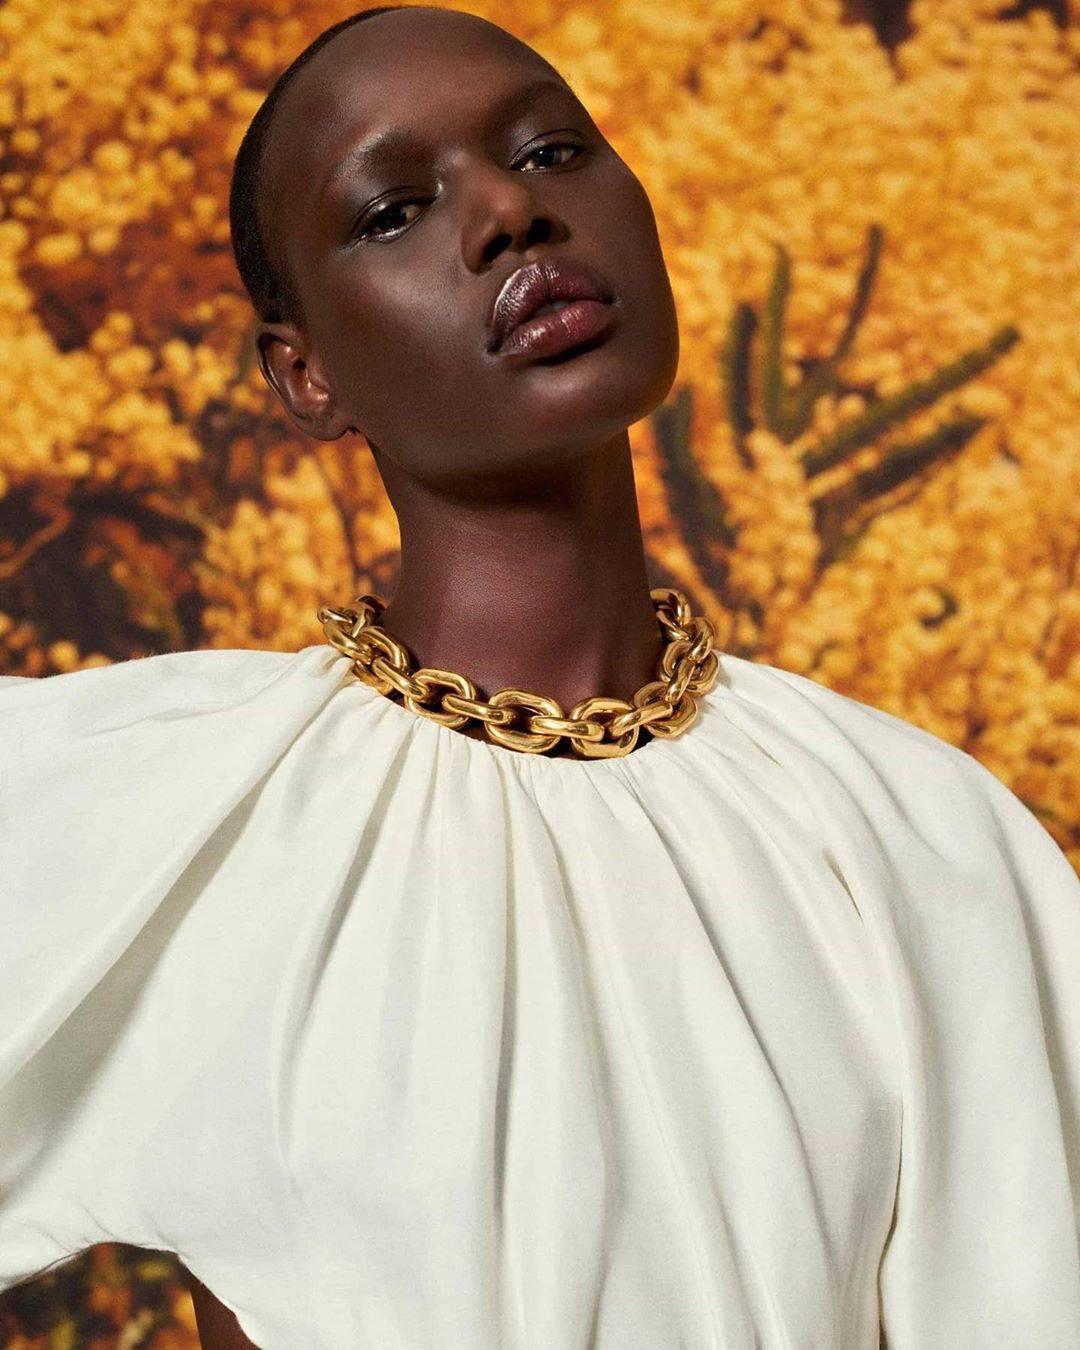 Super model Ajak Deng known for her dark excellence tone